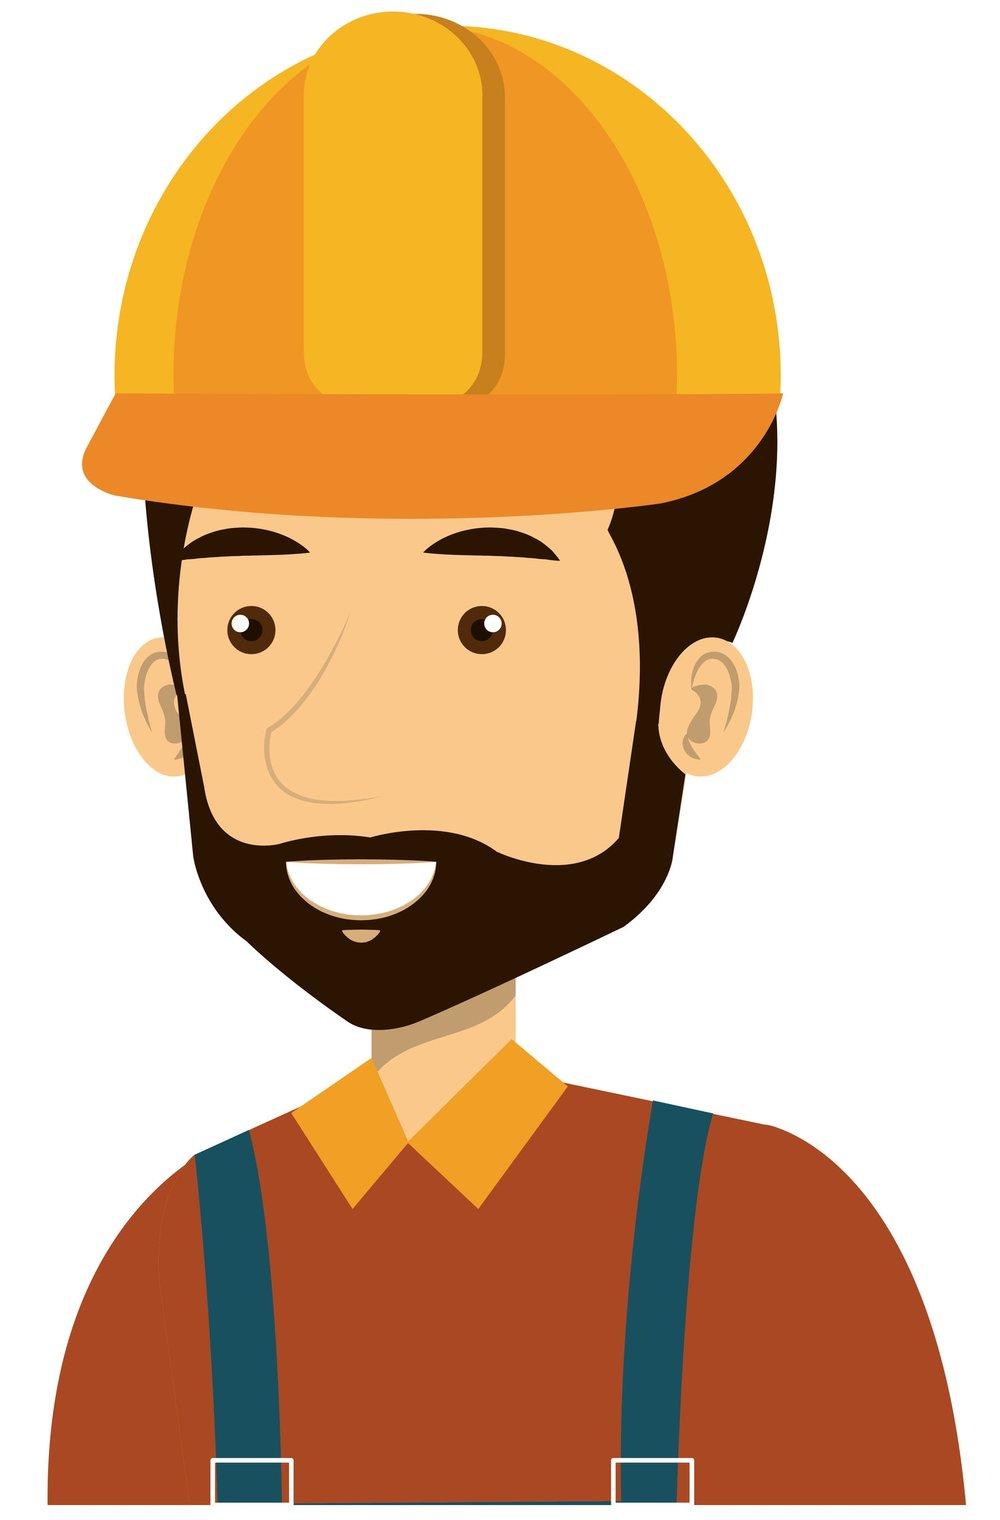 ConstructionWorker_shutterstock_631287671.jpg